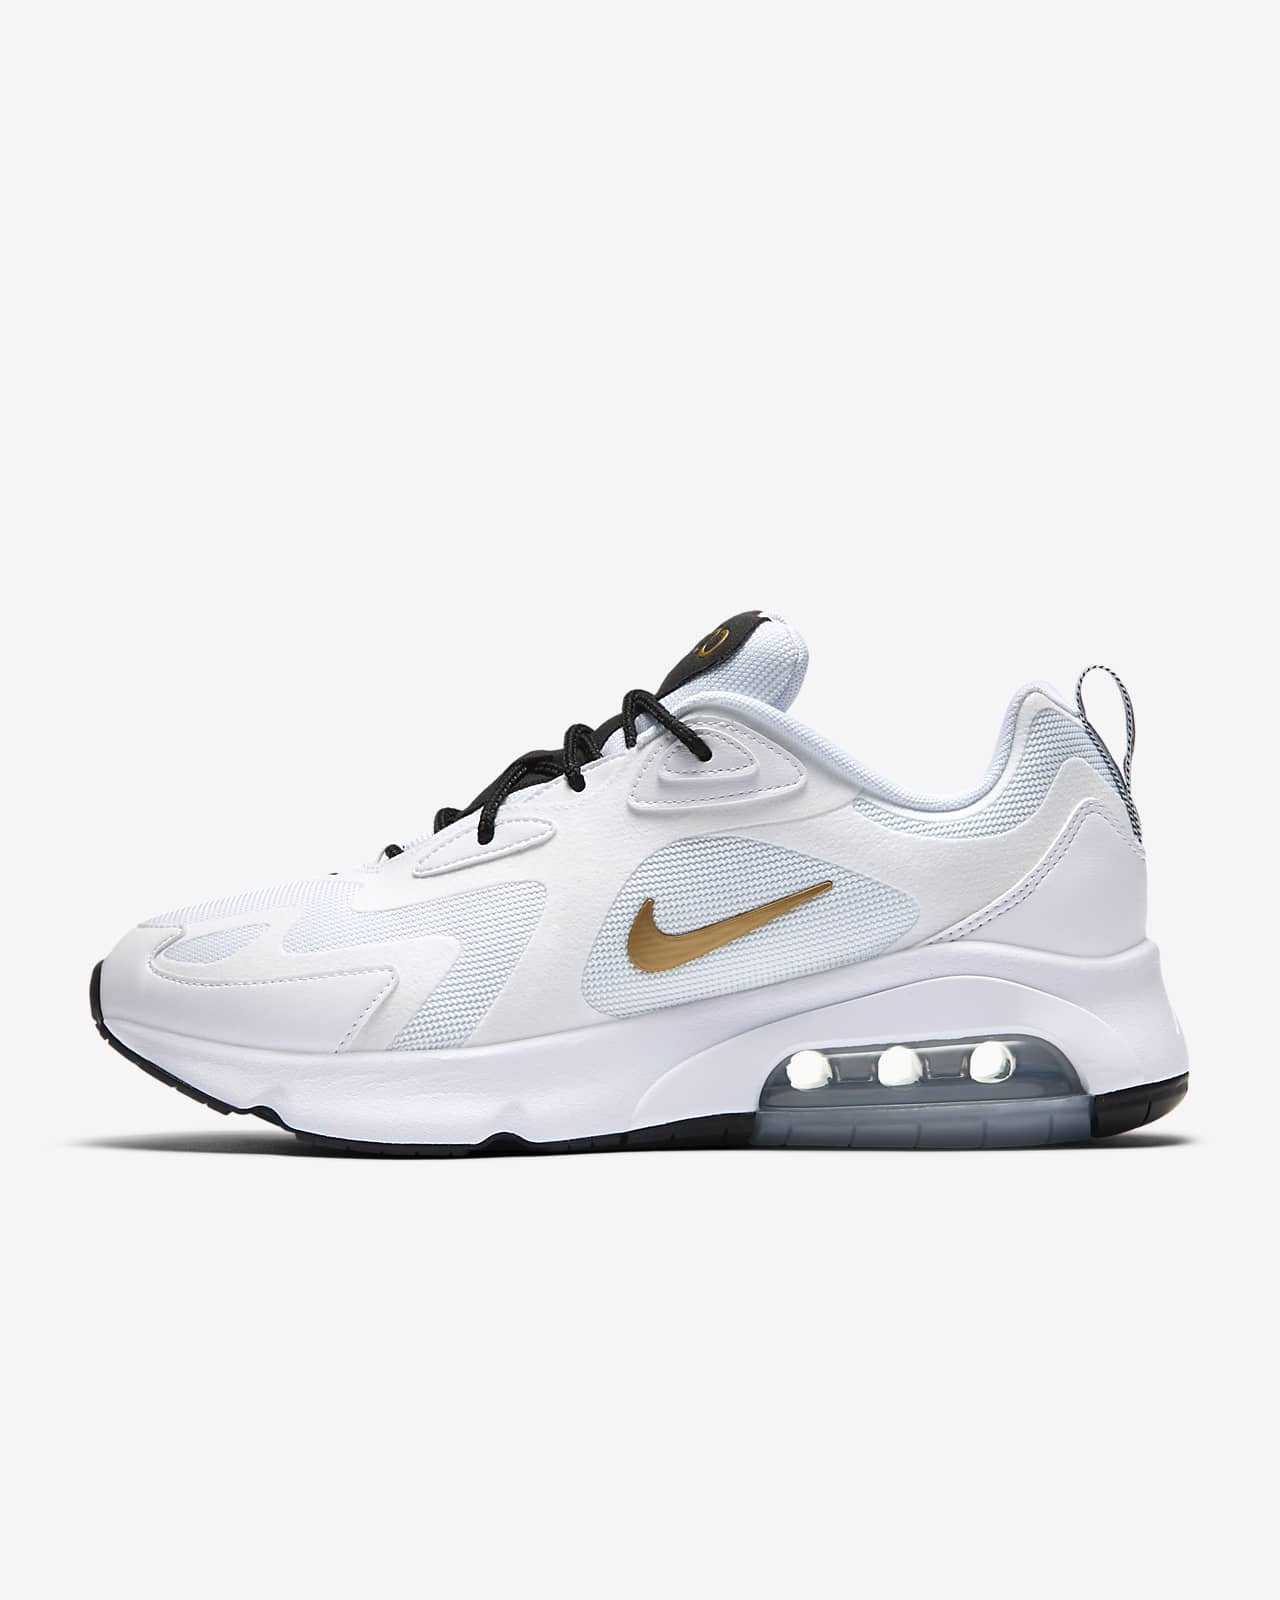 Nike Air Max 200 男子运动鞋